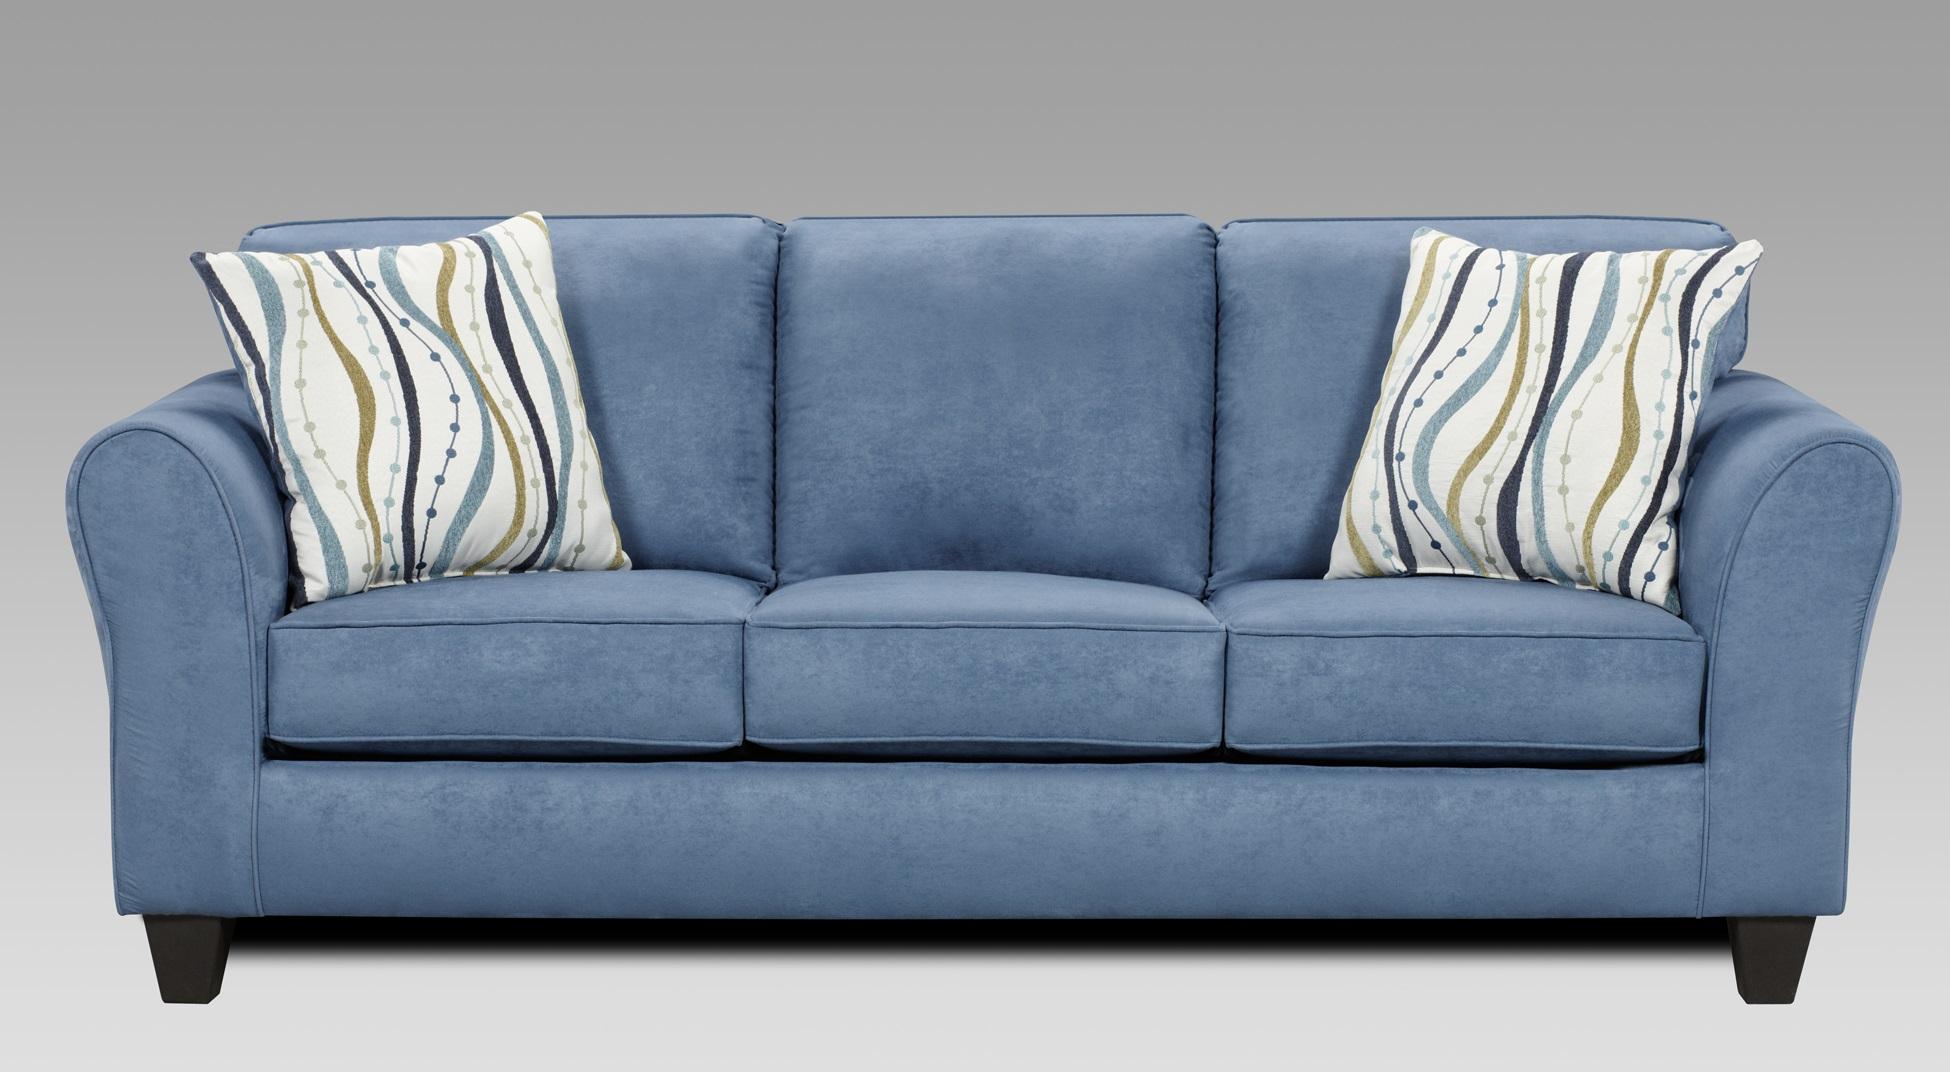 Blue Microfiber Sofa And Loveseat